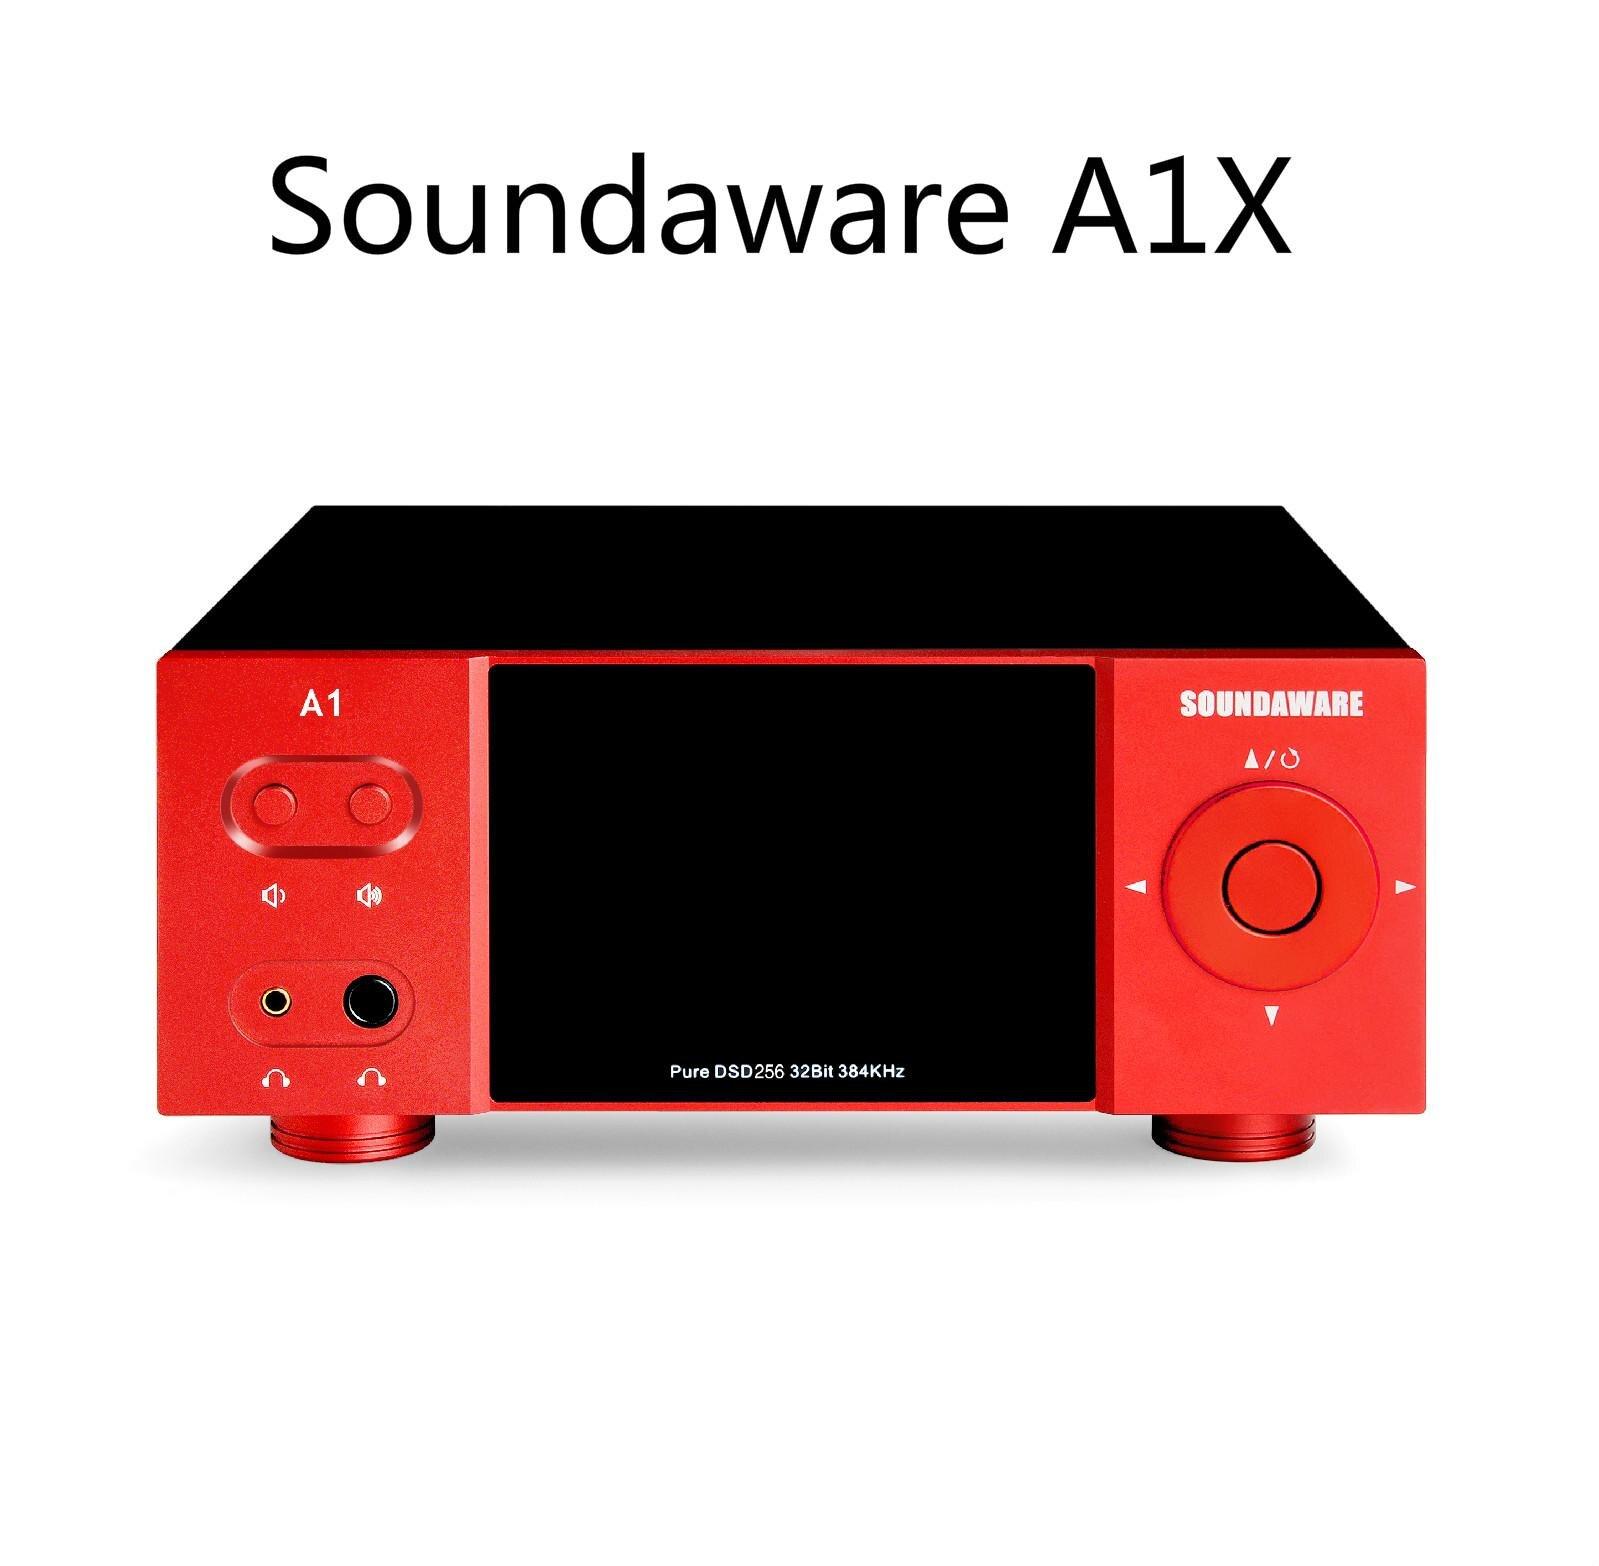 Soundaware A1X-مشغل موسيقى متدفق محلي متعدد الوظائف ، بطاقة SD ، Airplay ، Roon DLNA ، USB ، DAC ، AMP ، CD Player ، DSD256 ، PCM384